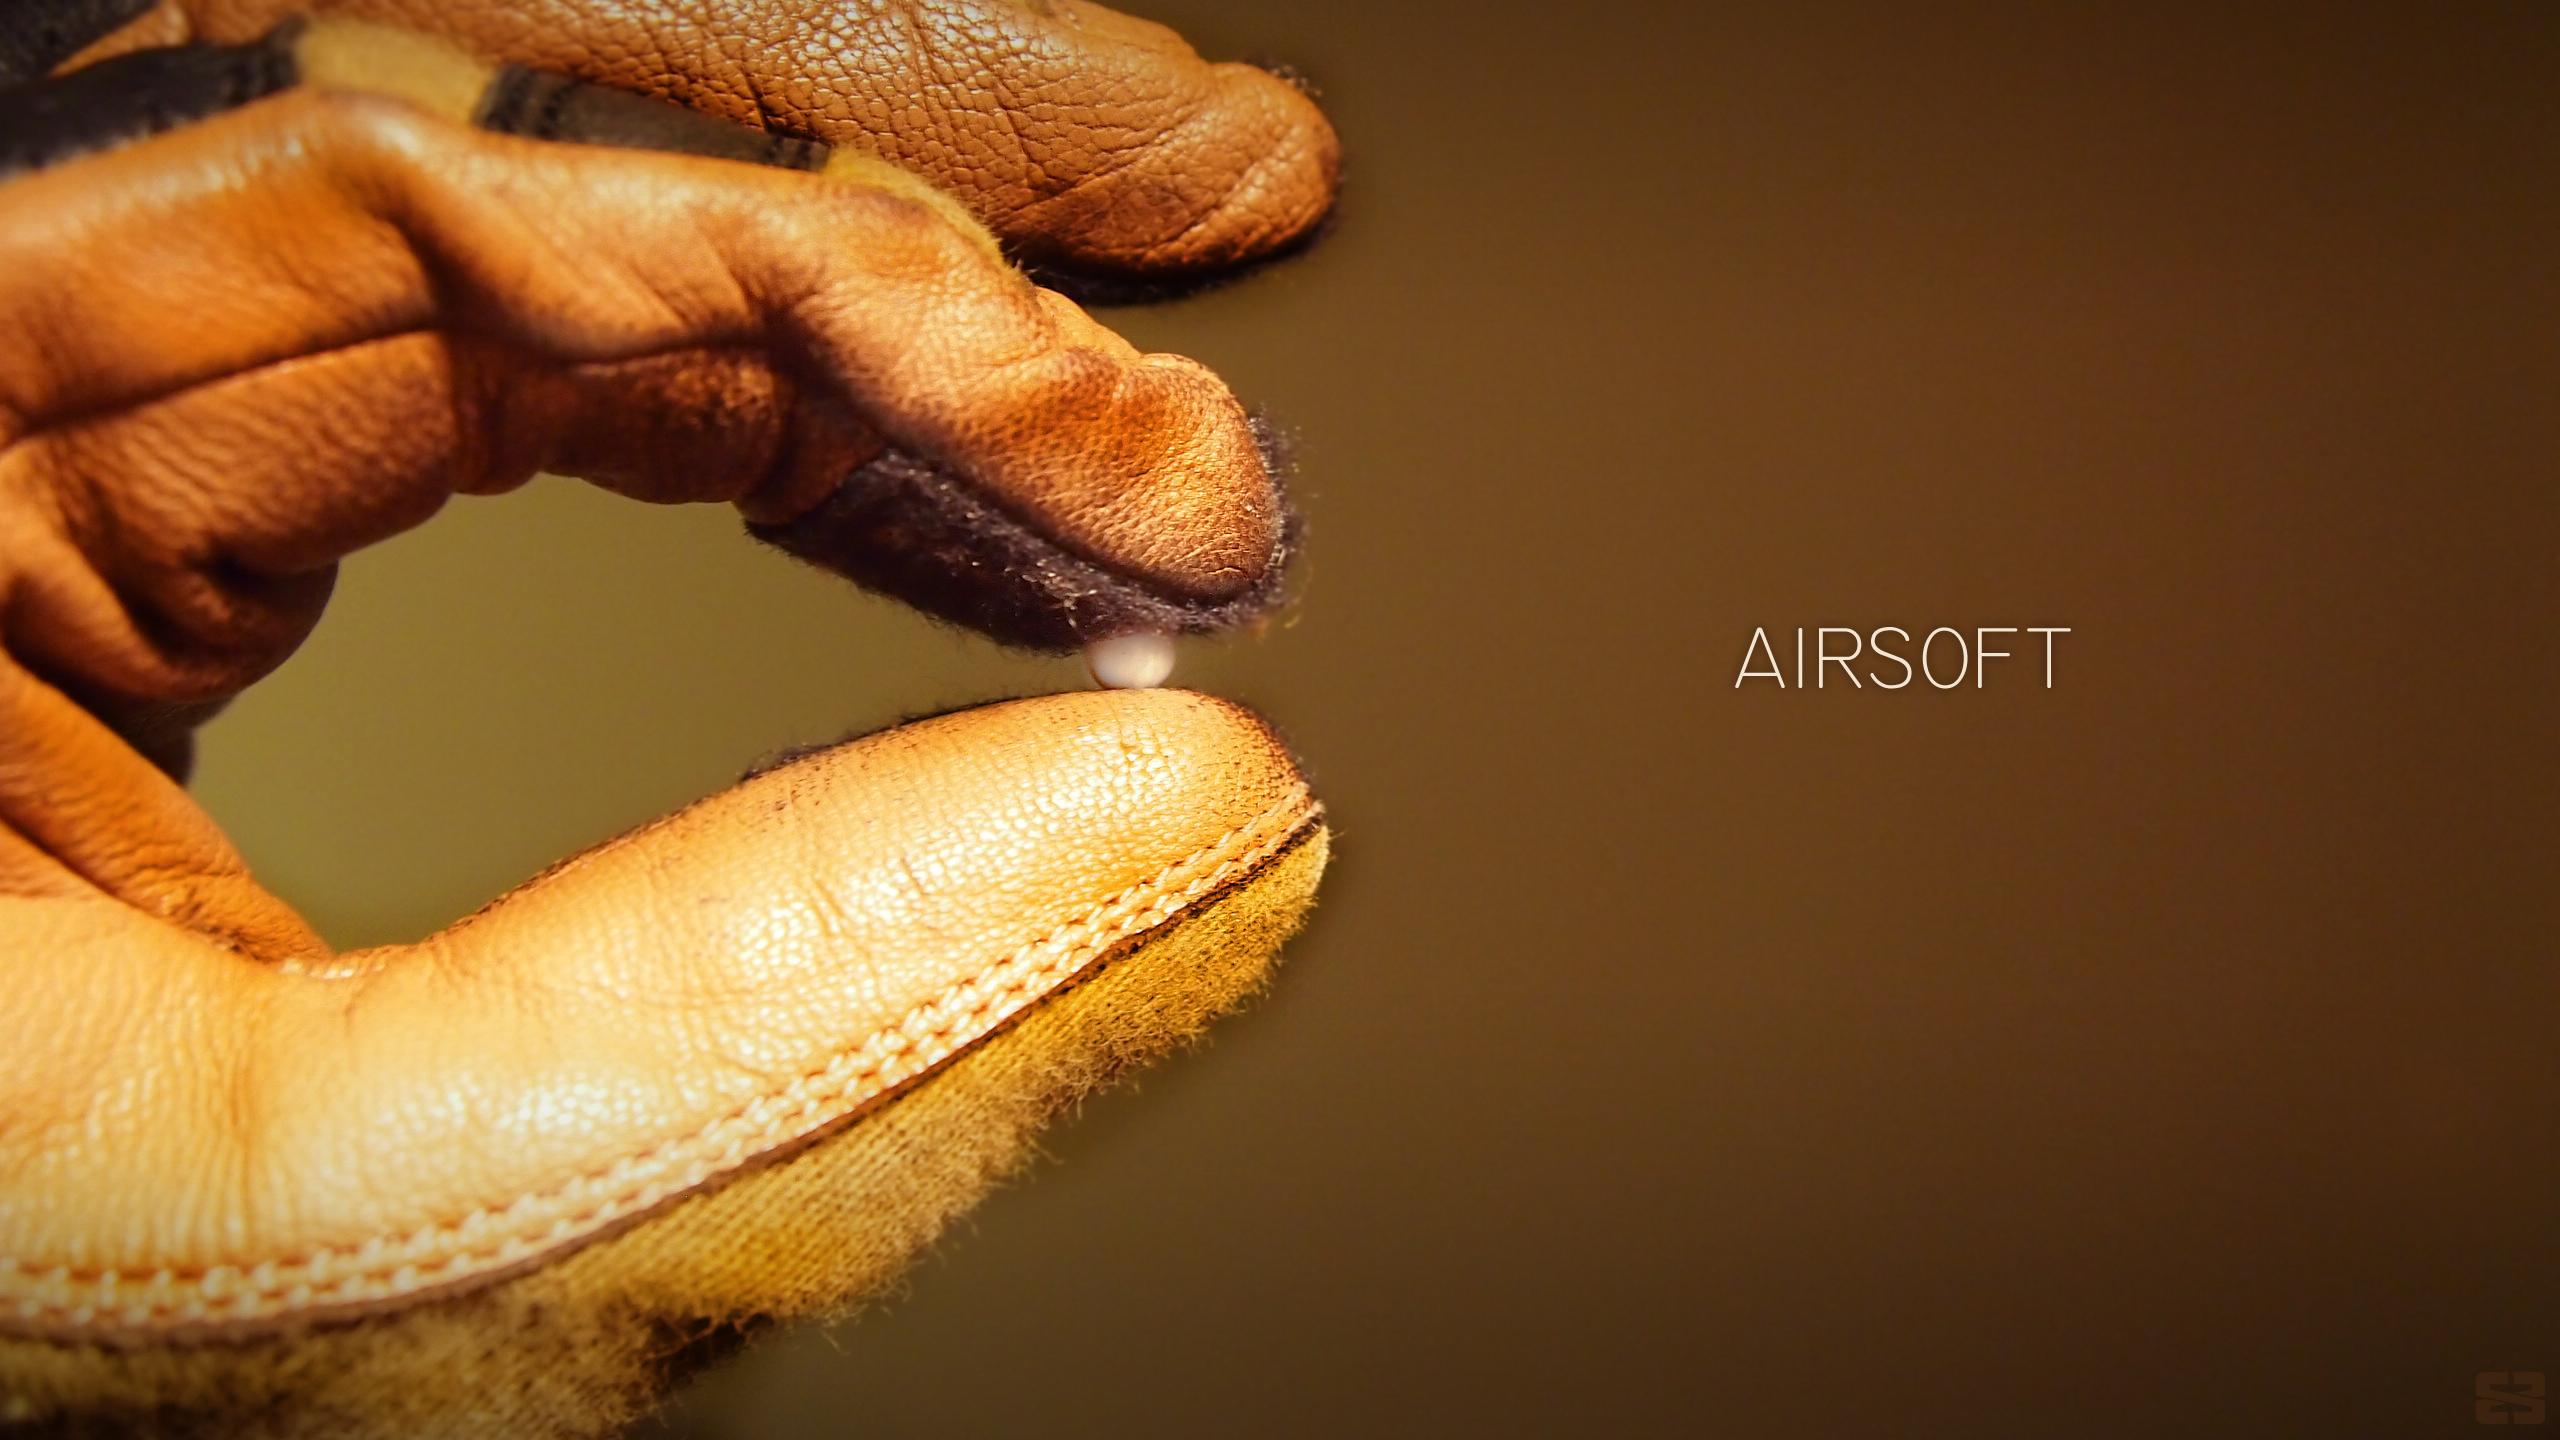 Airsoft wallpaper 2560x1440